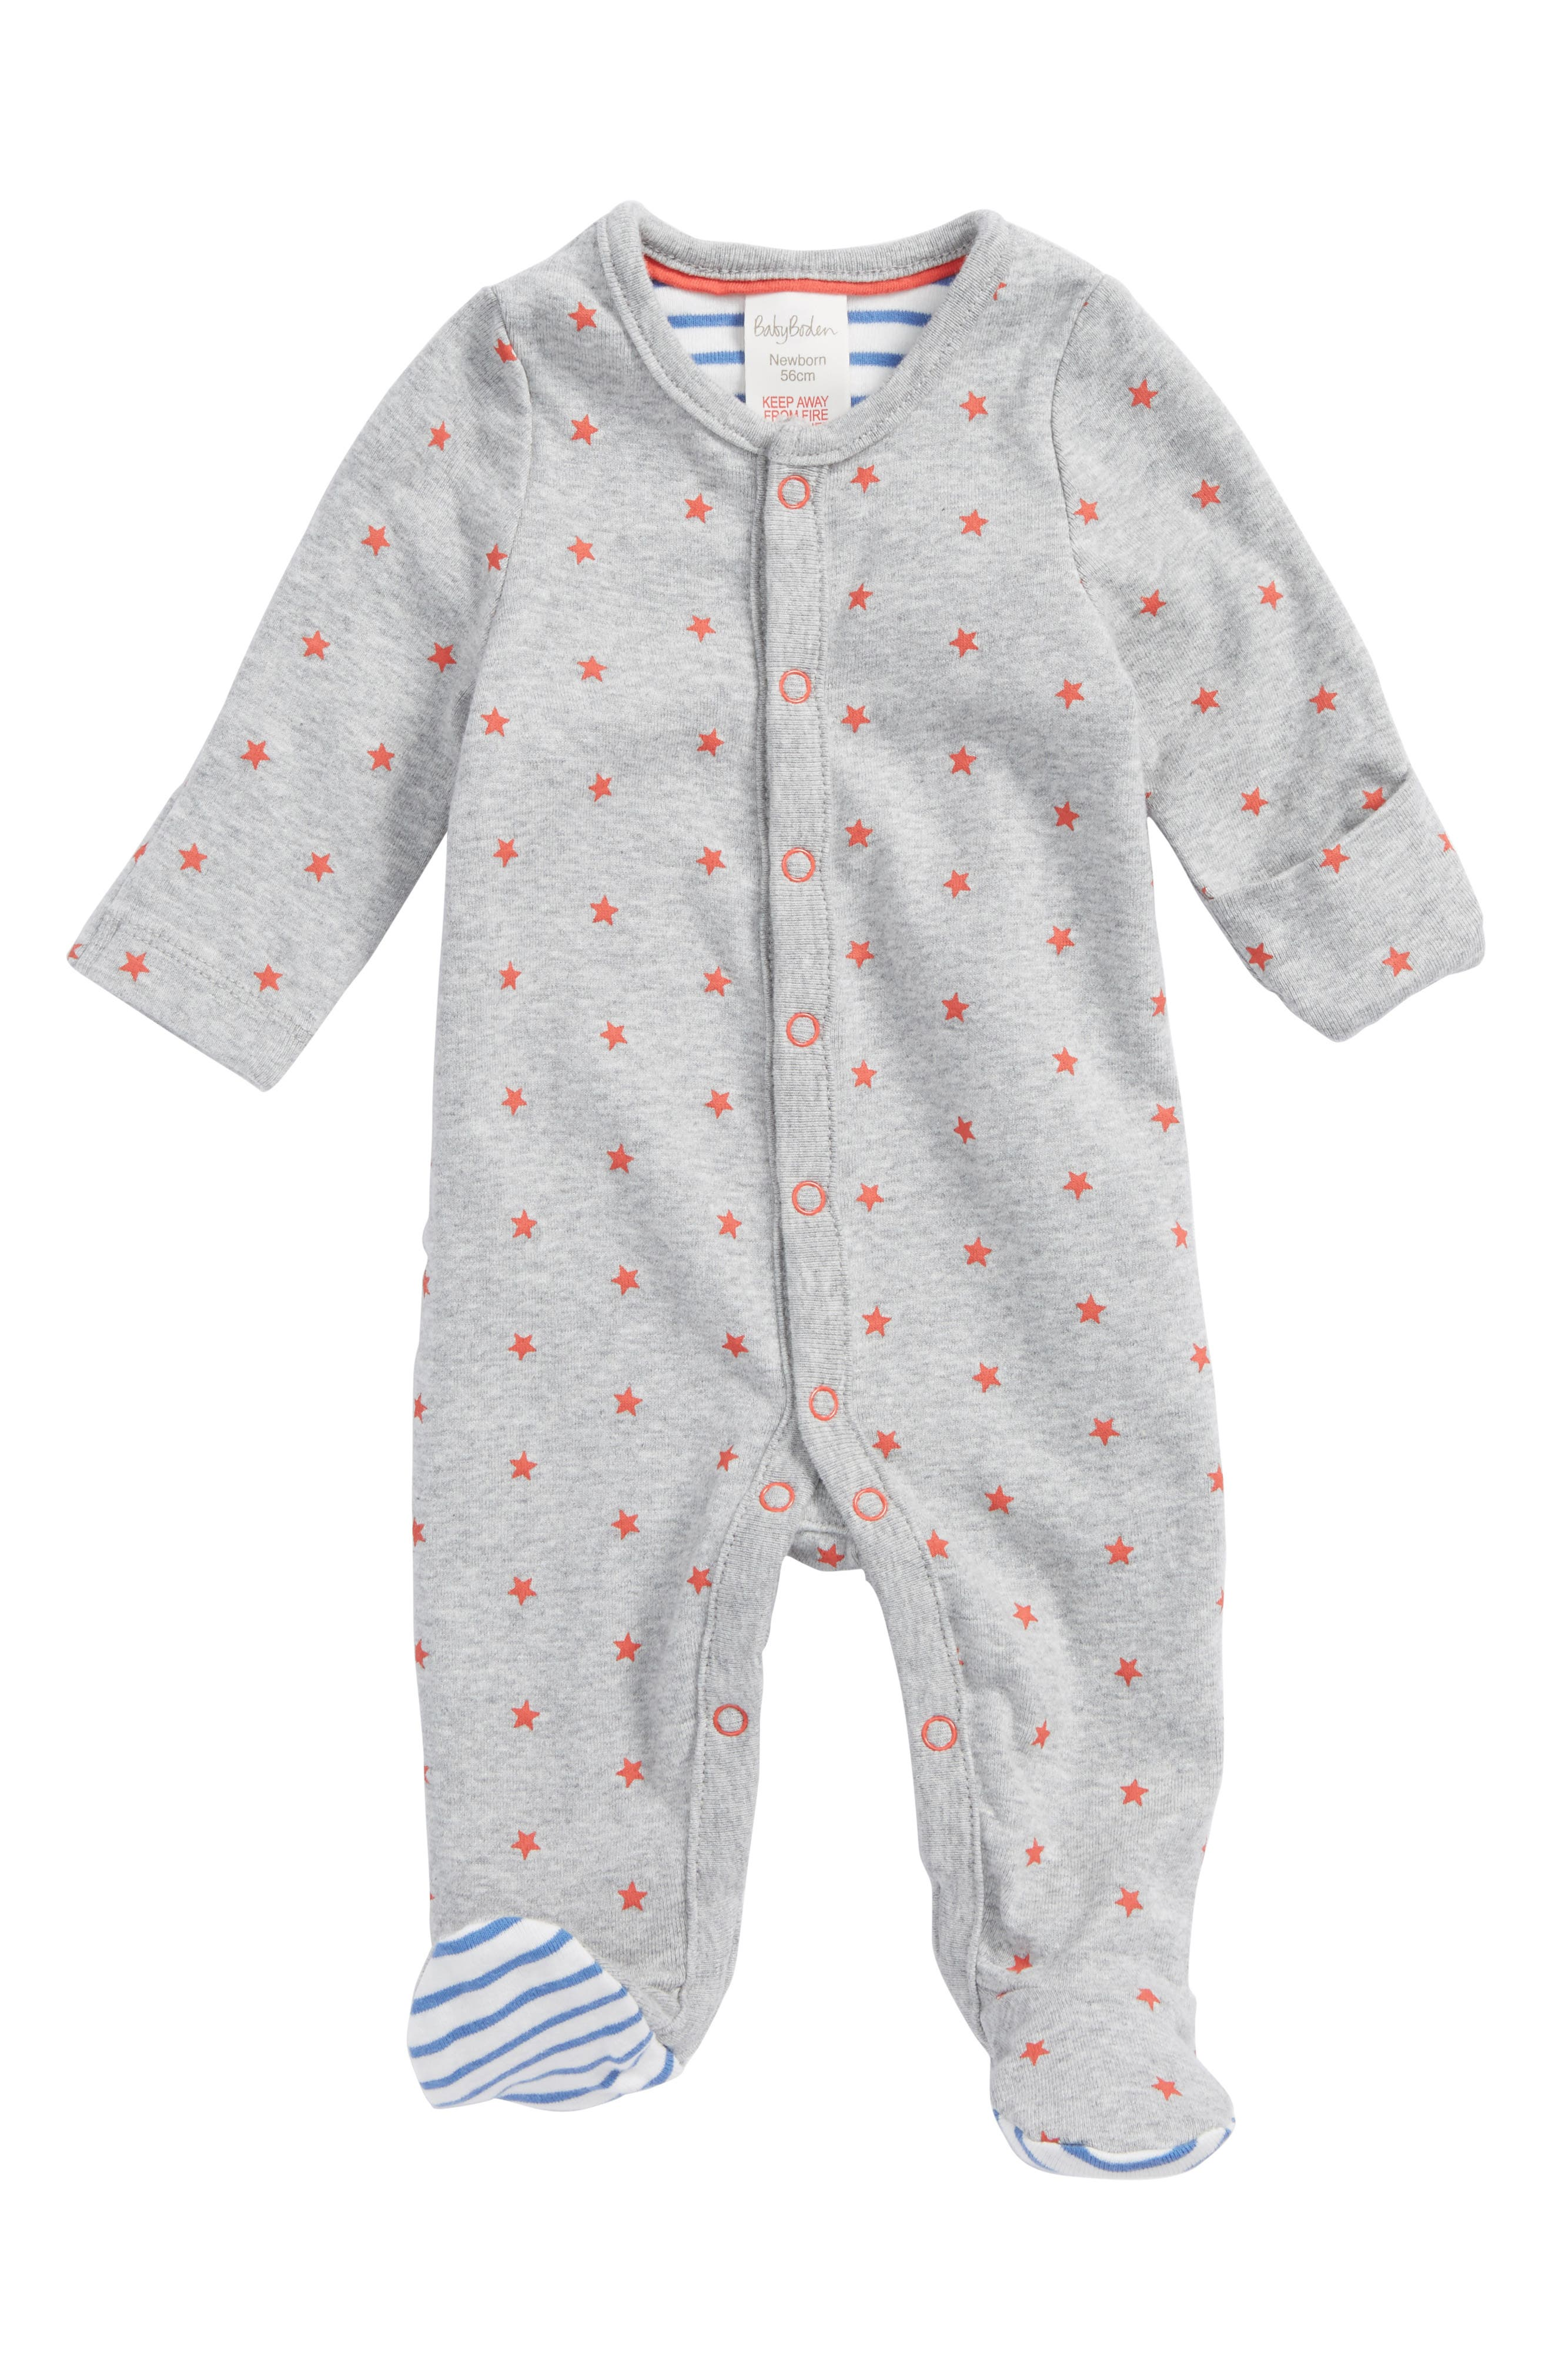 Print Organic Cotton One-Piece Pajamas,                             Main thumbnail 1, color,                             Grey Marl/ Crayon Red